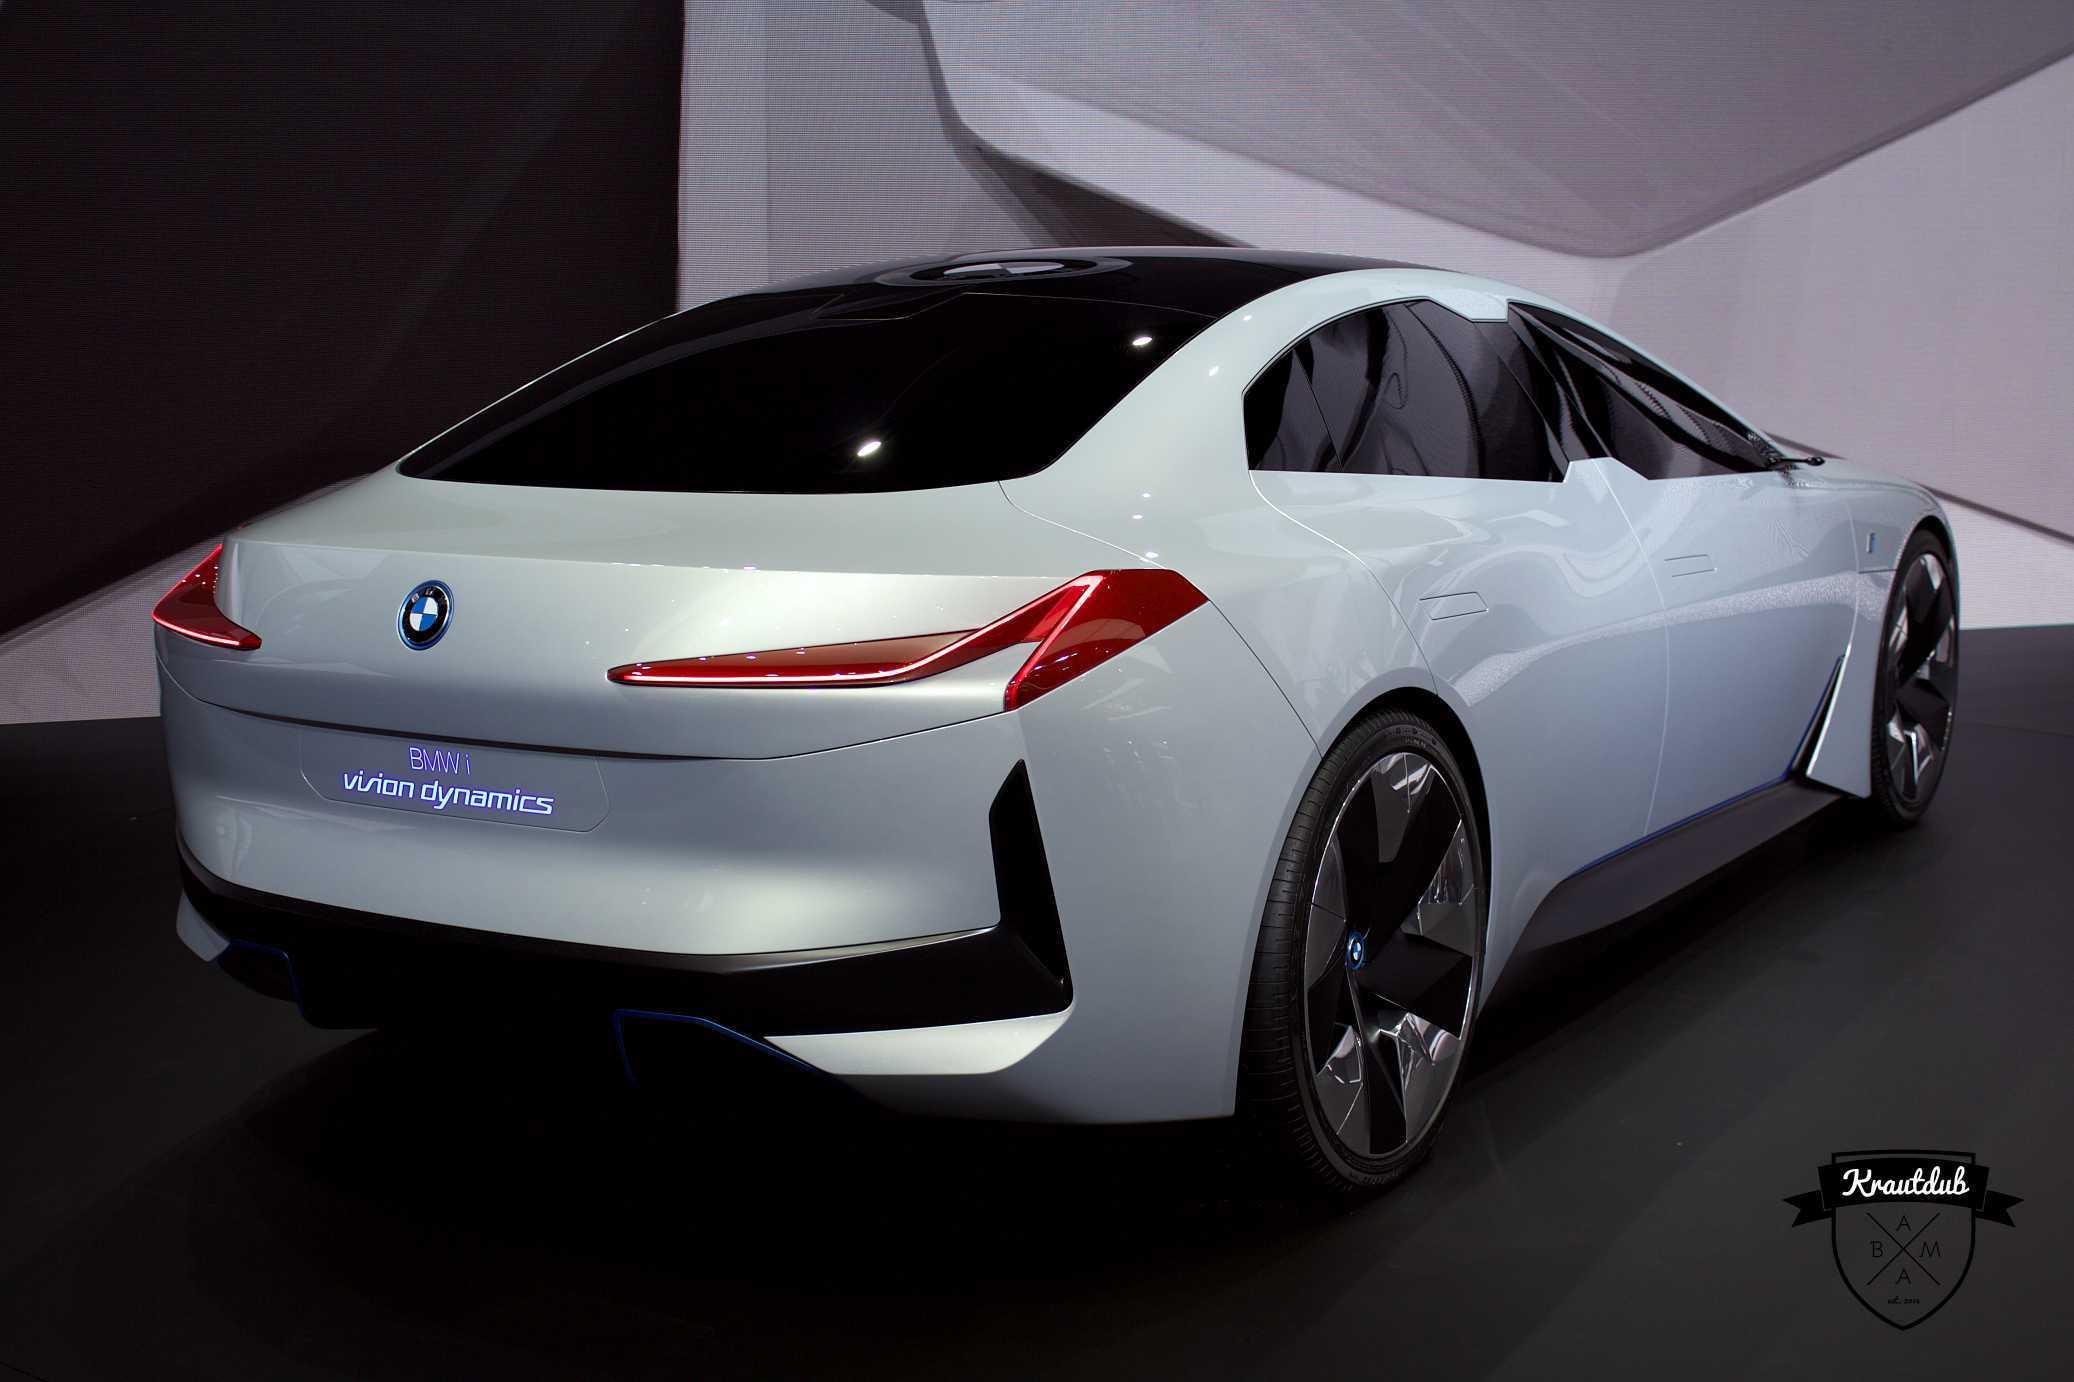 BMW vision dynamics - IAA 2017